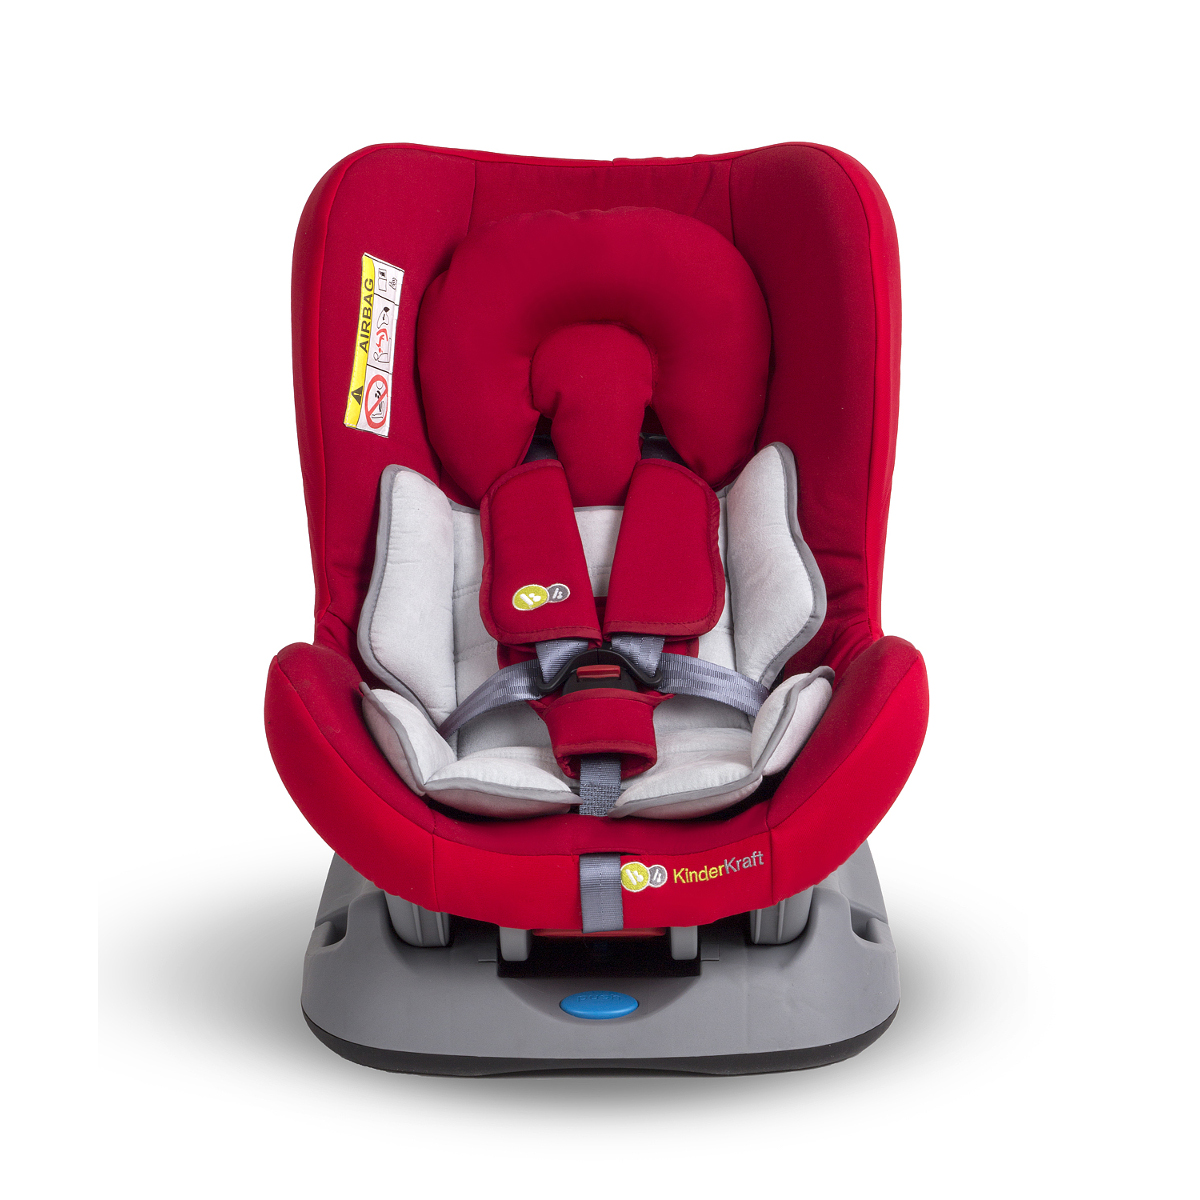 auto kindersitz 0 18 kg gruppe 0 1 kinderautositz autositz baby neu coby rot ebay. Black Bedroom Furniture Sets. Home Design Ideas